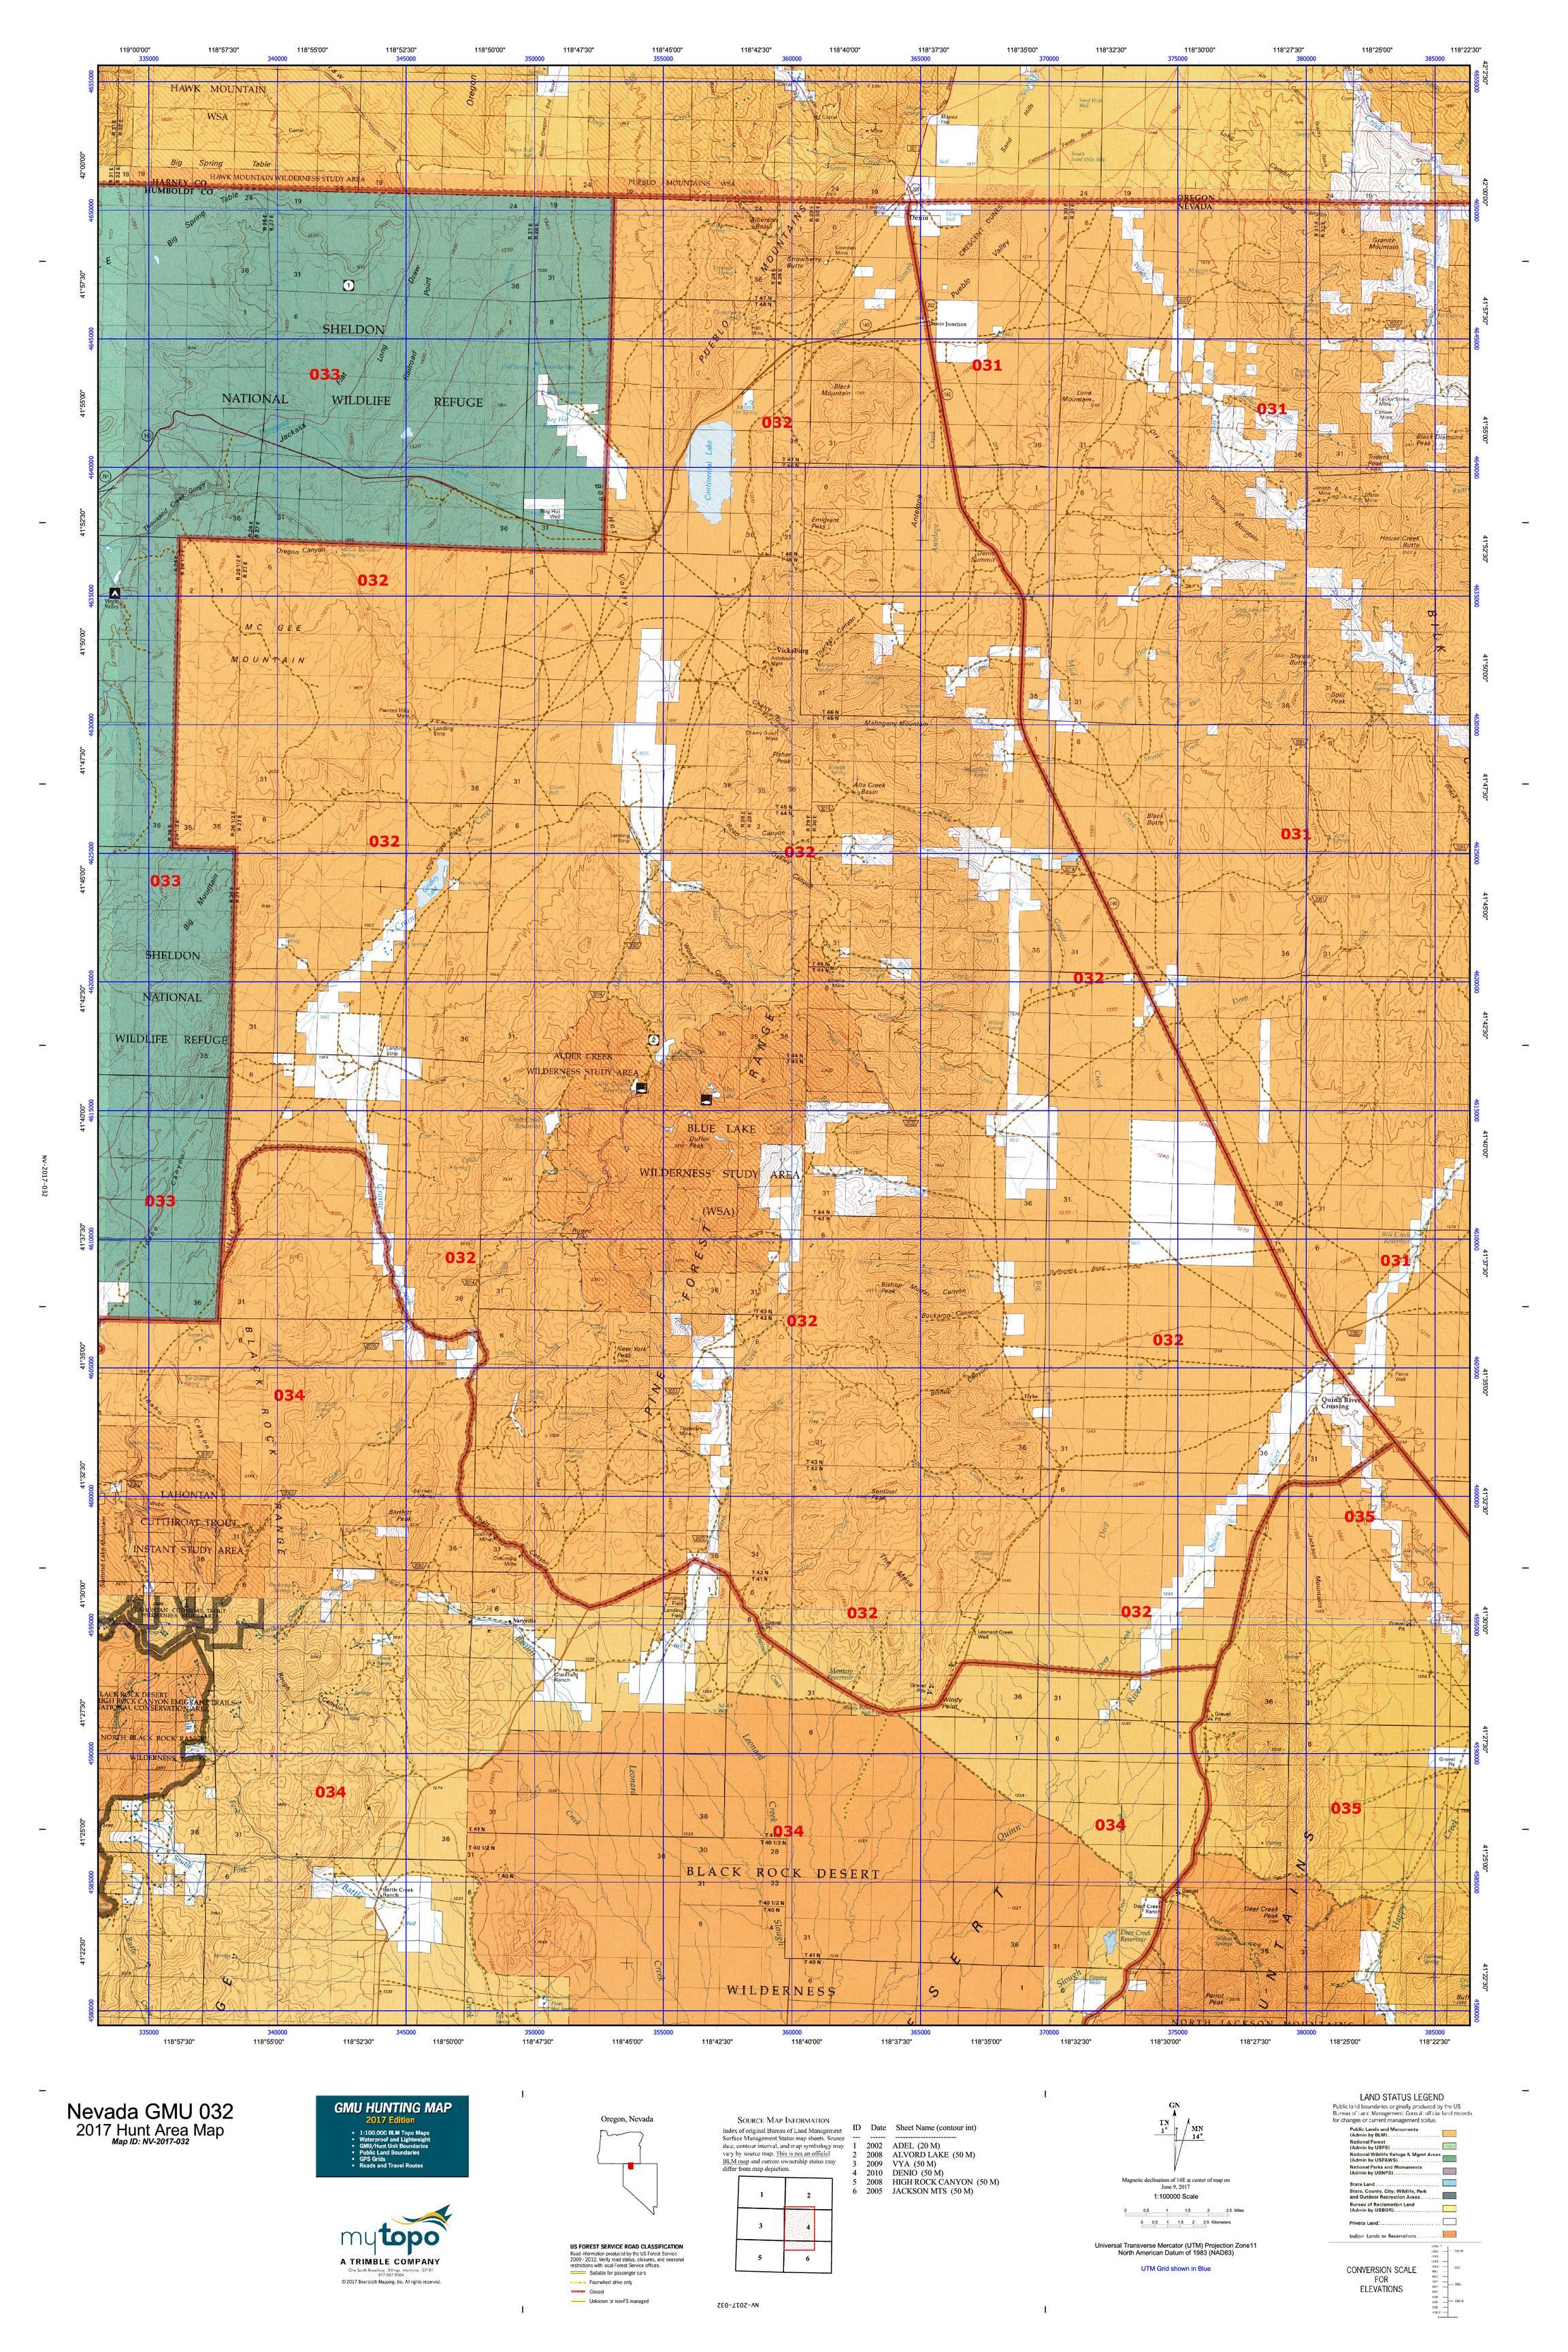 Nevada GMU Map MyTopo - A map of nevada